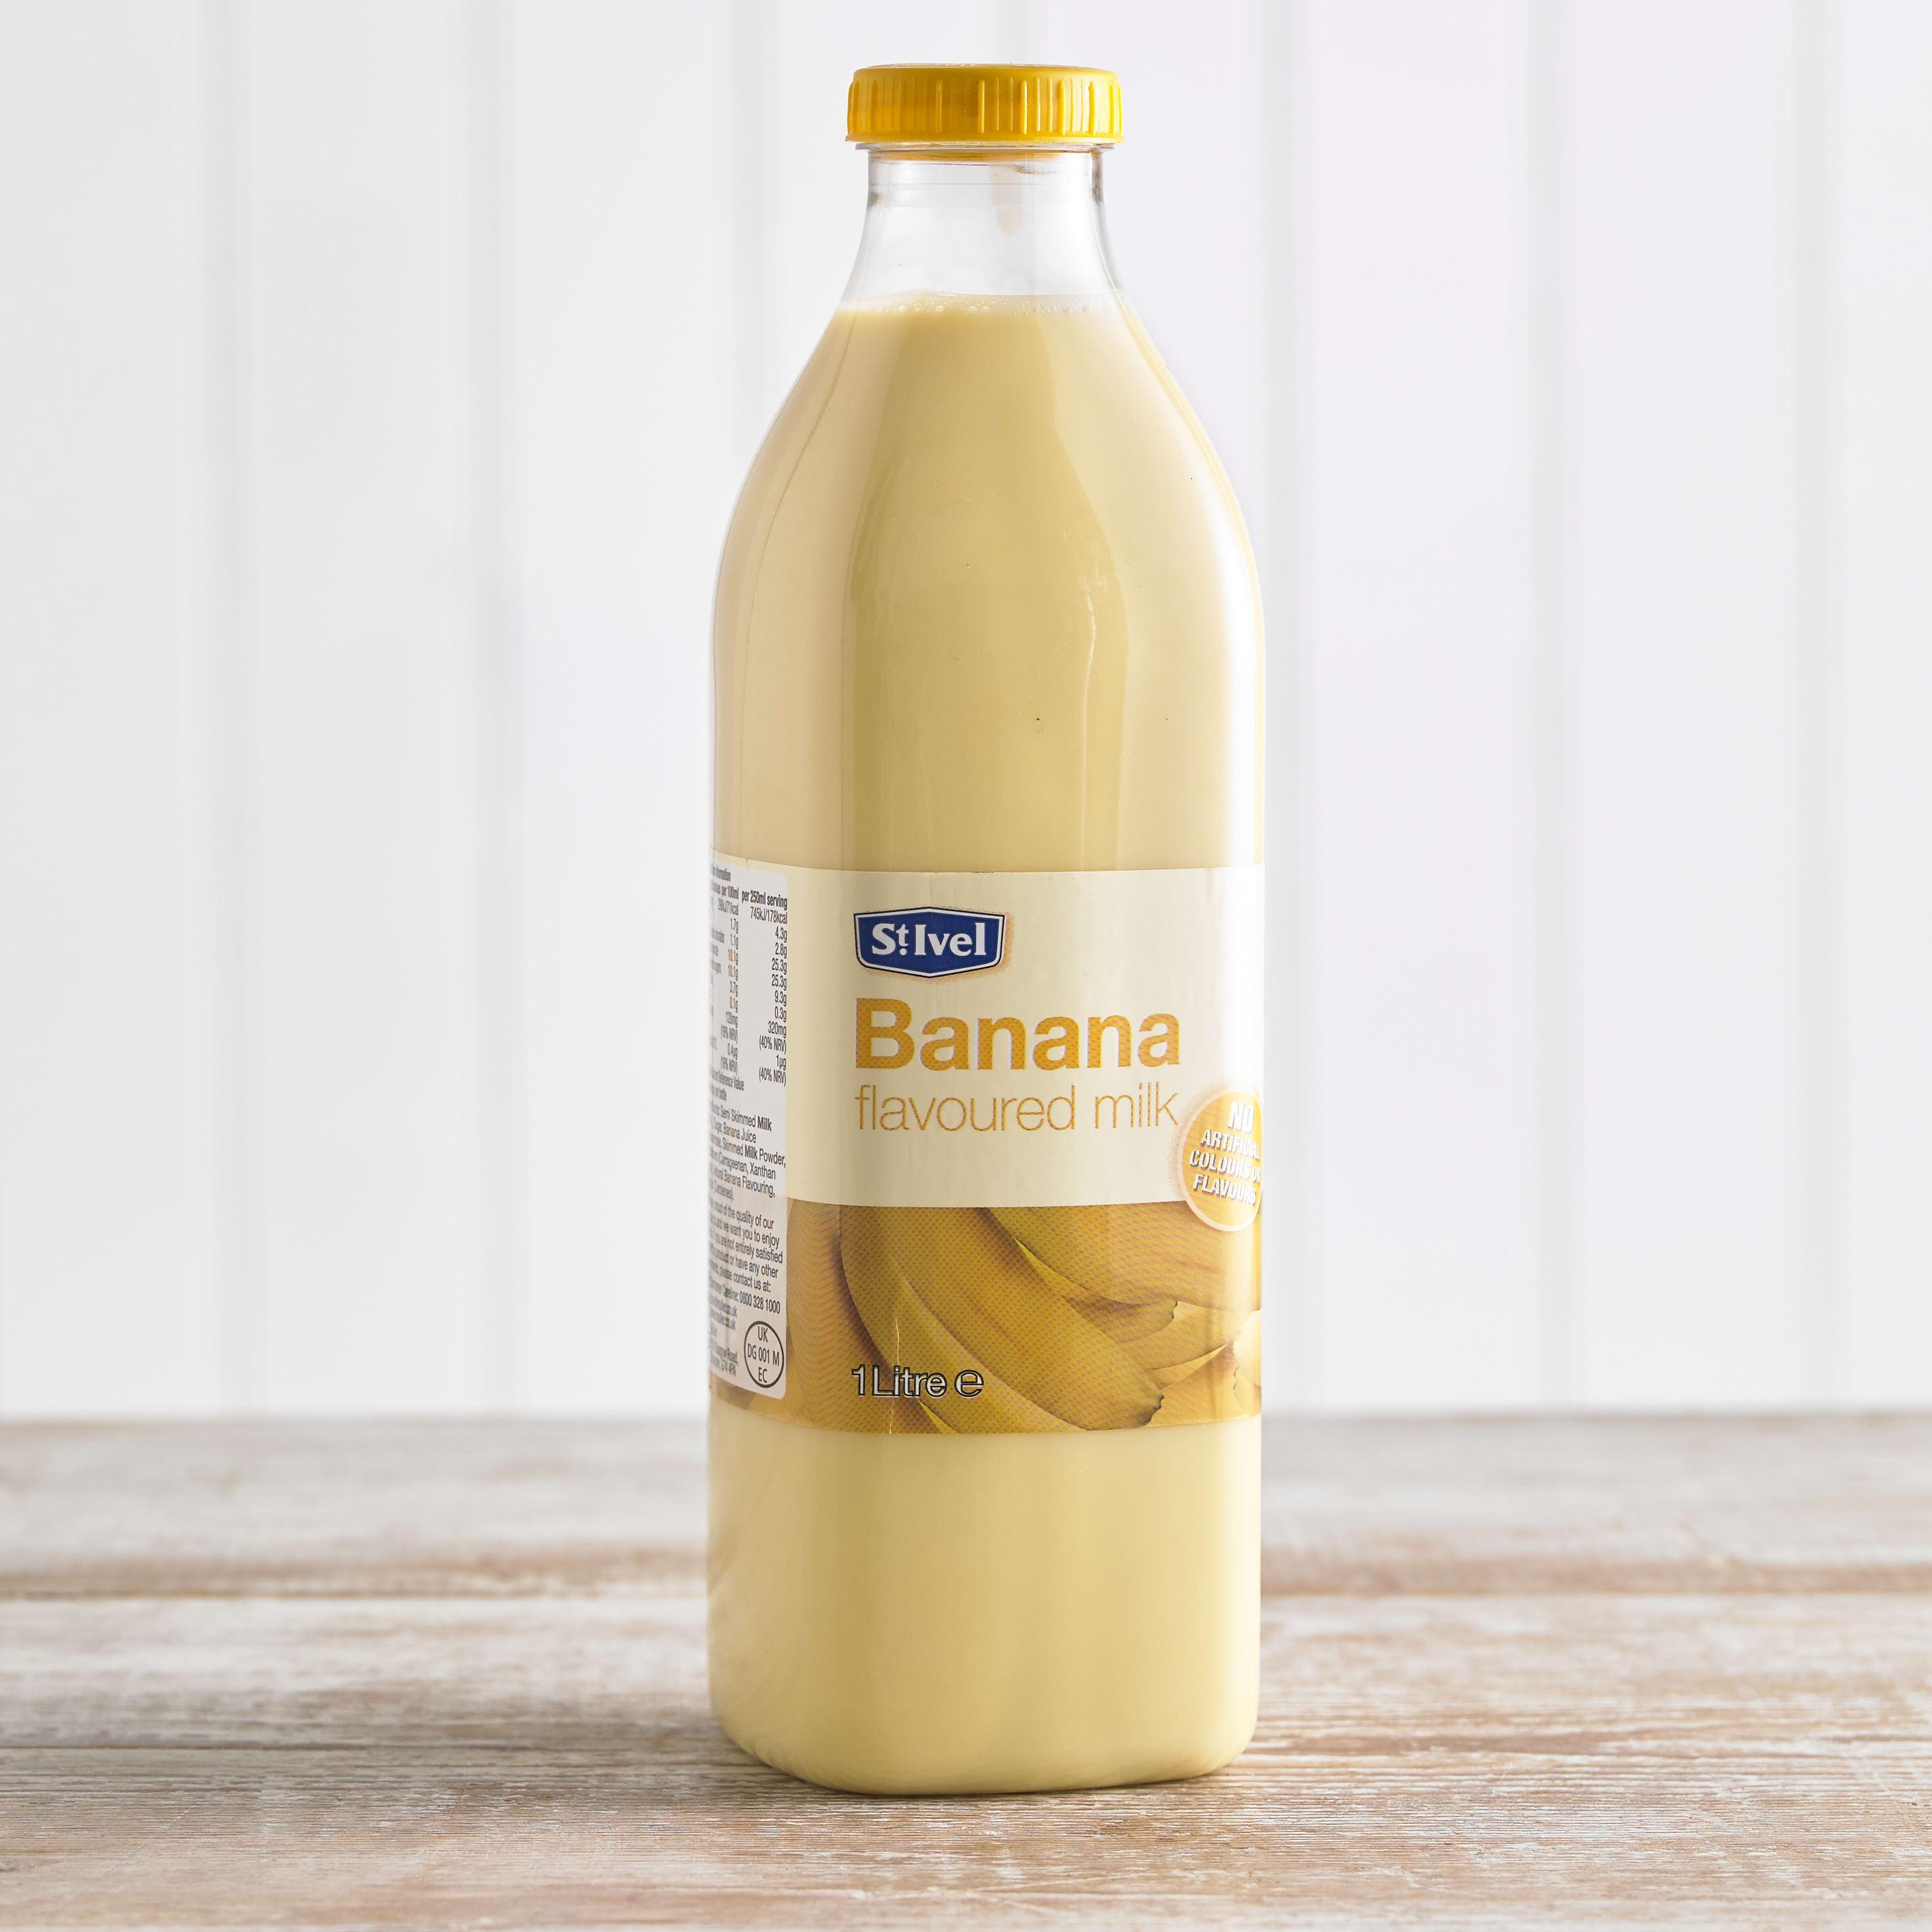 St Ivel Flavoured Milk Drink Banana, 1L